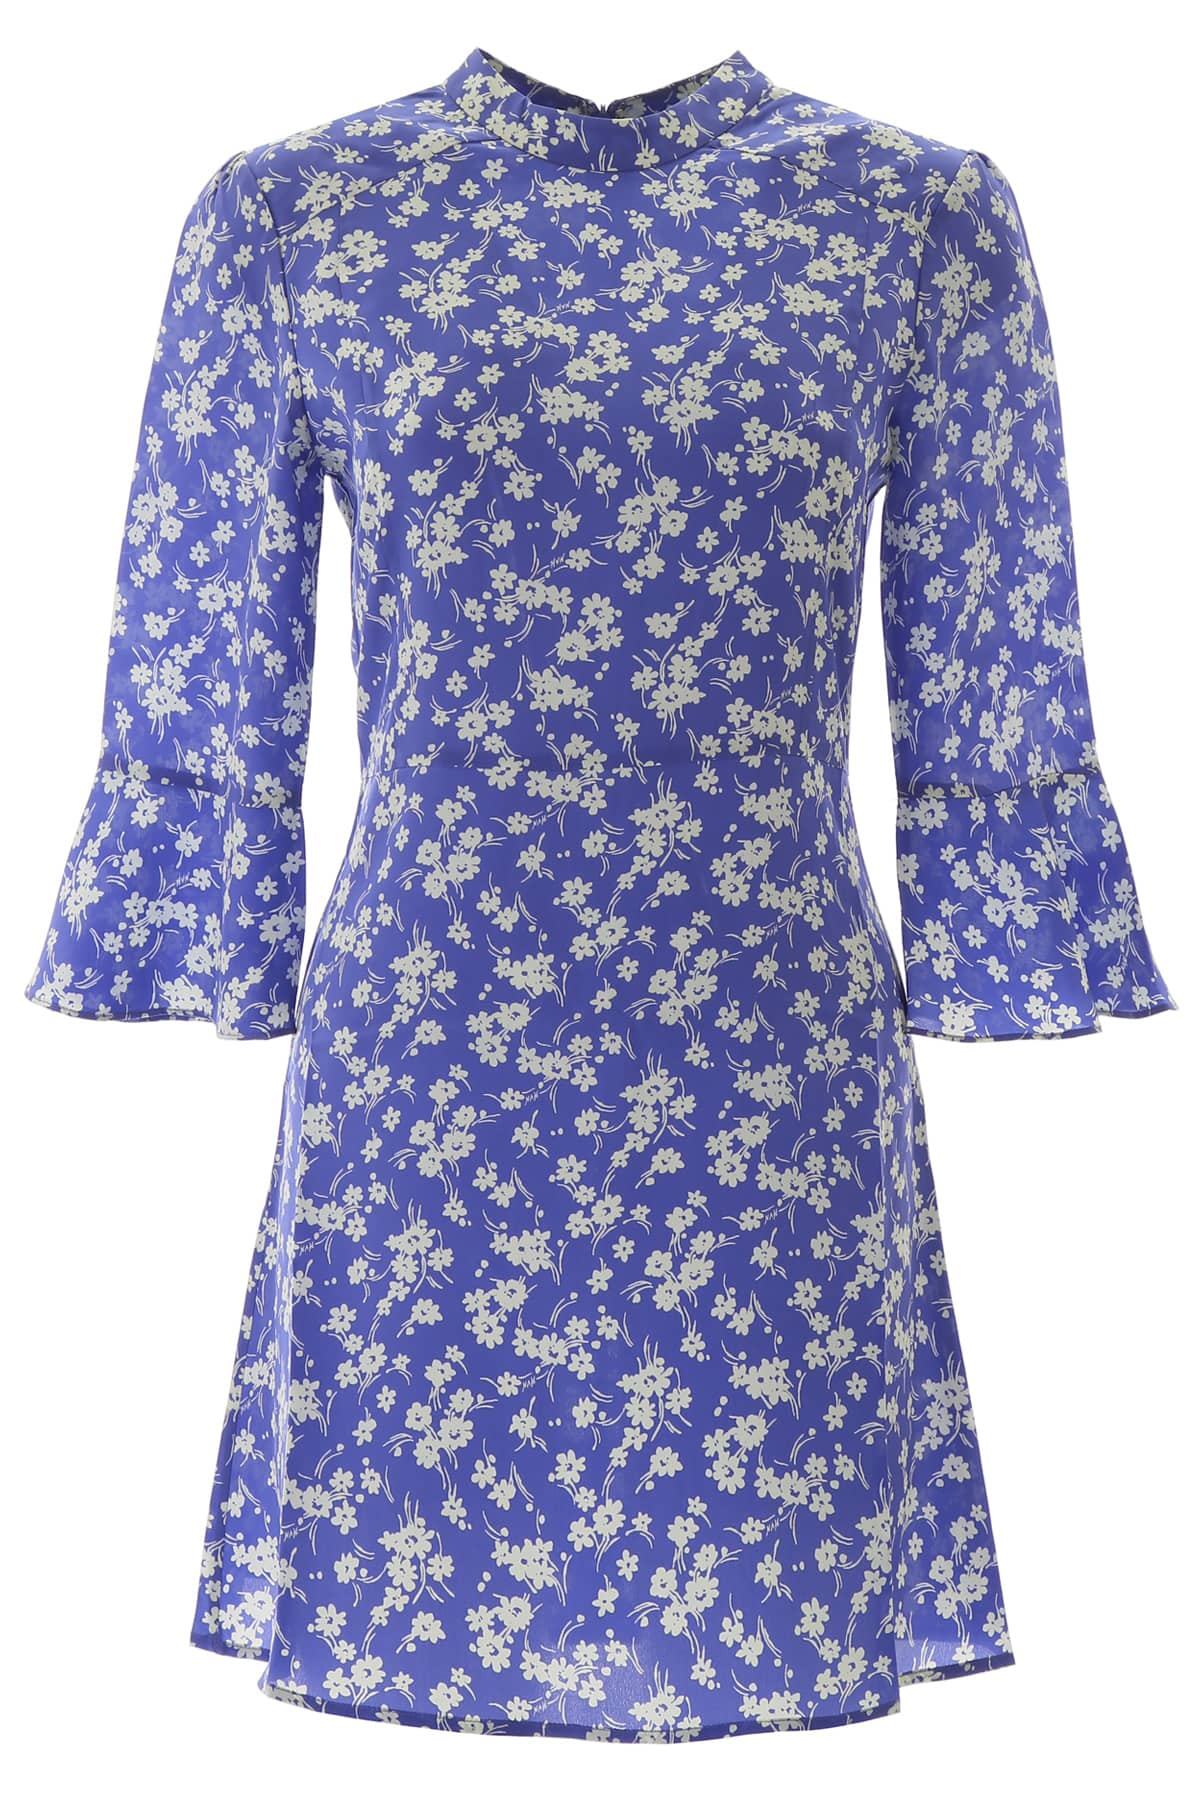 HVN ASHLEY MINI DRESS 4 Purple, White Silk